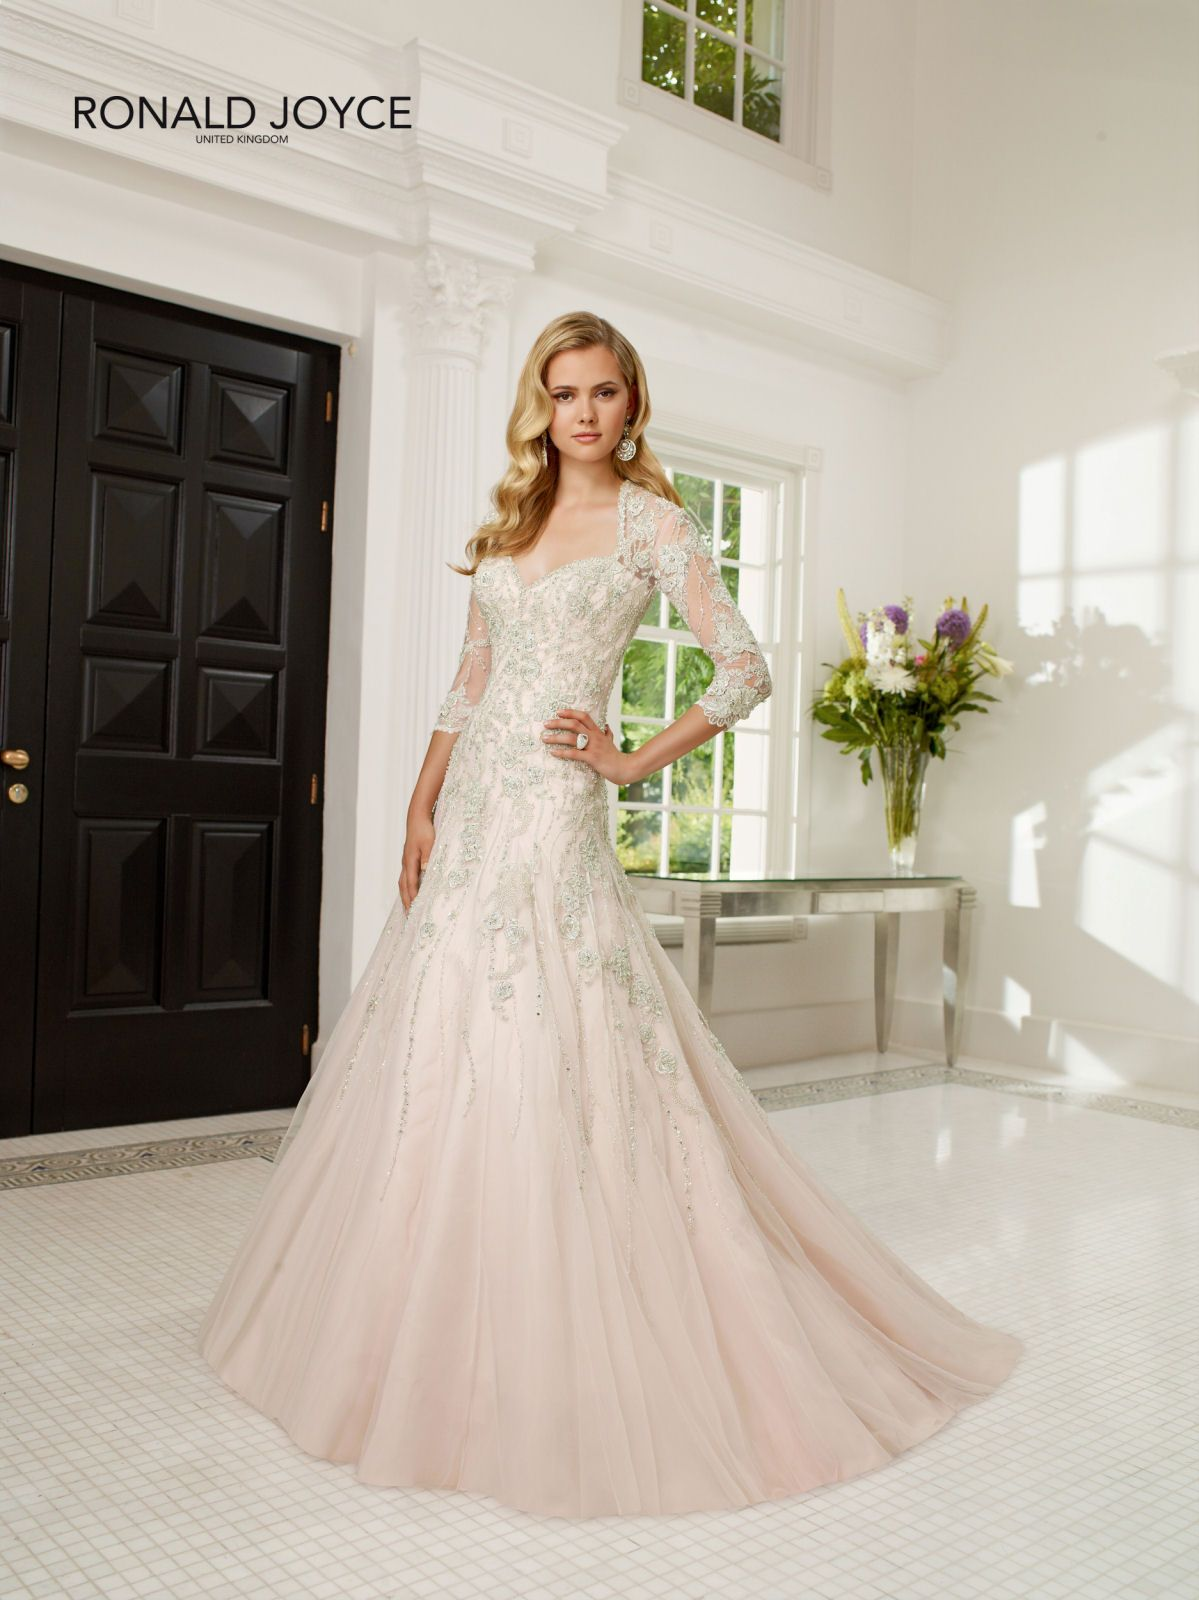 Beautiful weddings dresses pinterest ronald joyce wedding